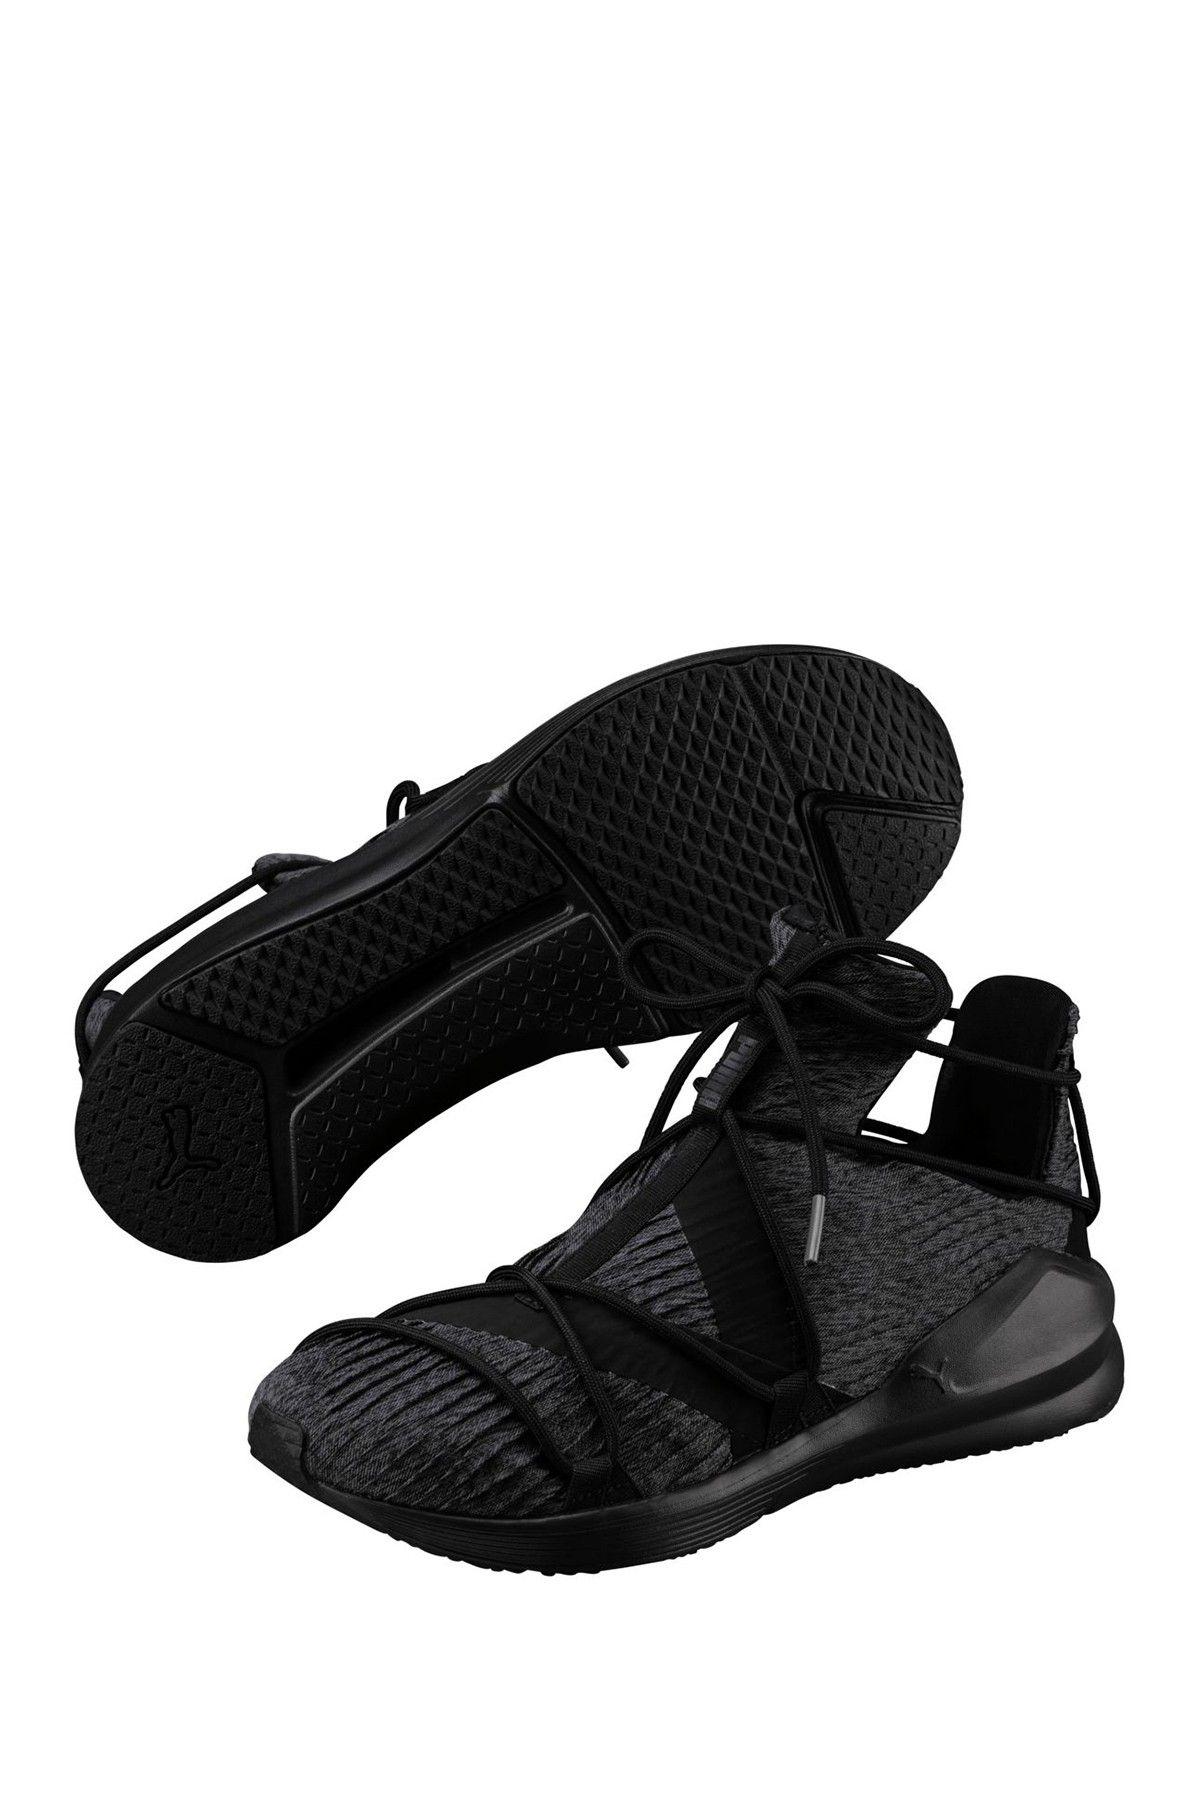 3a195dc40c6 Fierce Rope Training Sneaker by PUMA on  nordstrom rack